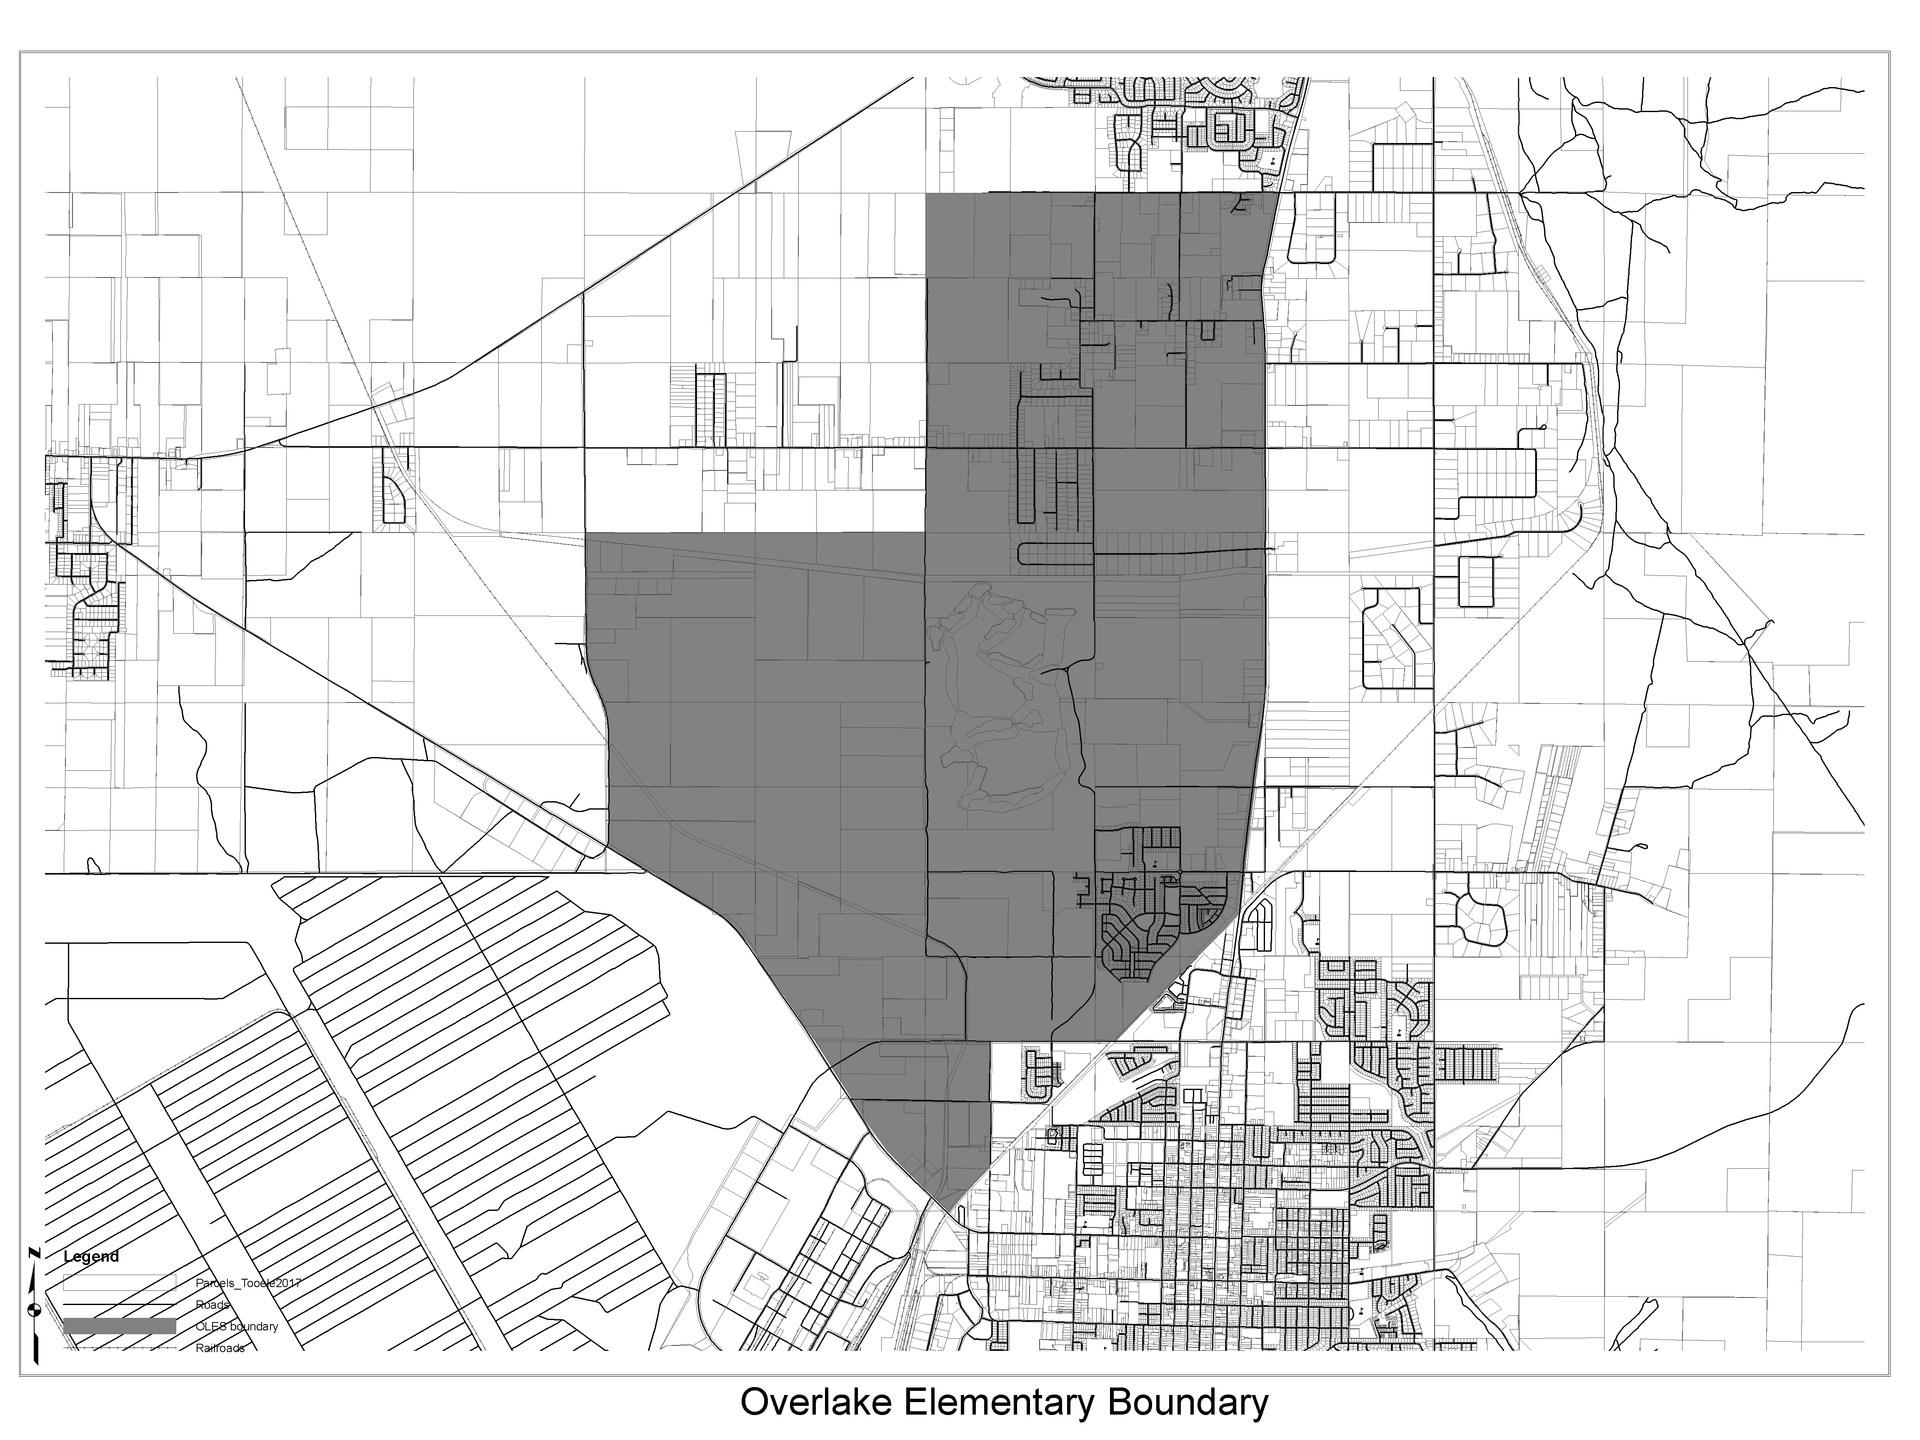 Overlake Elementary School boundary